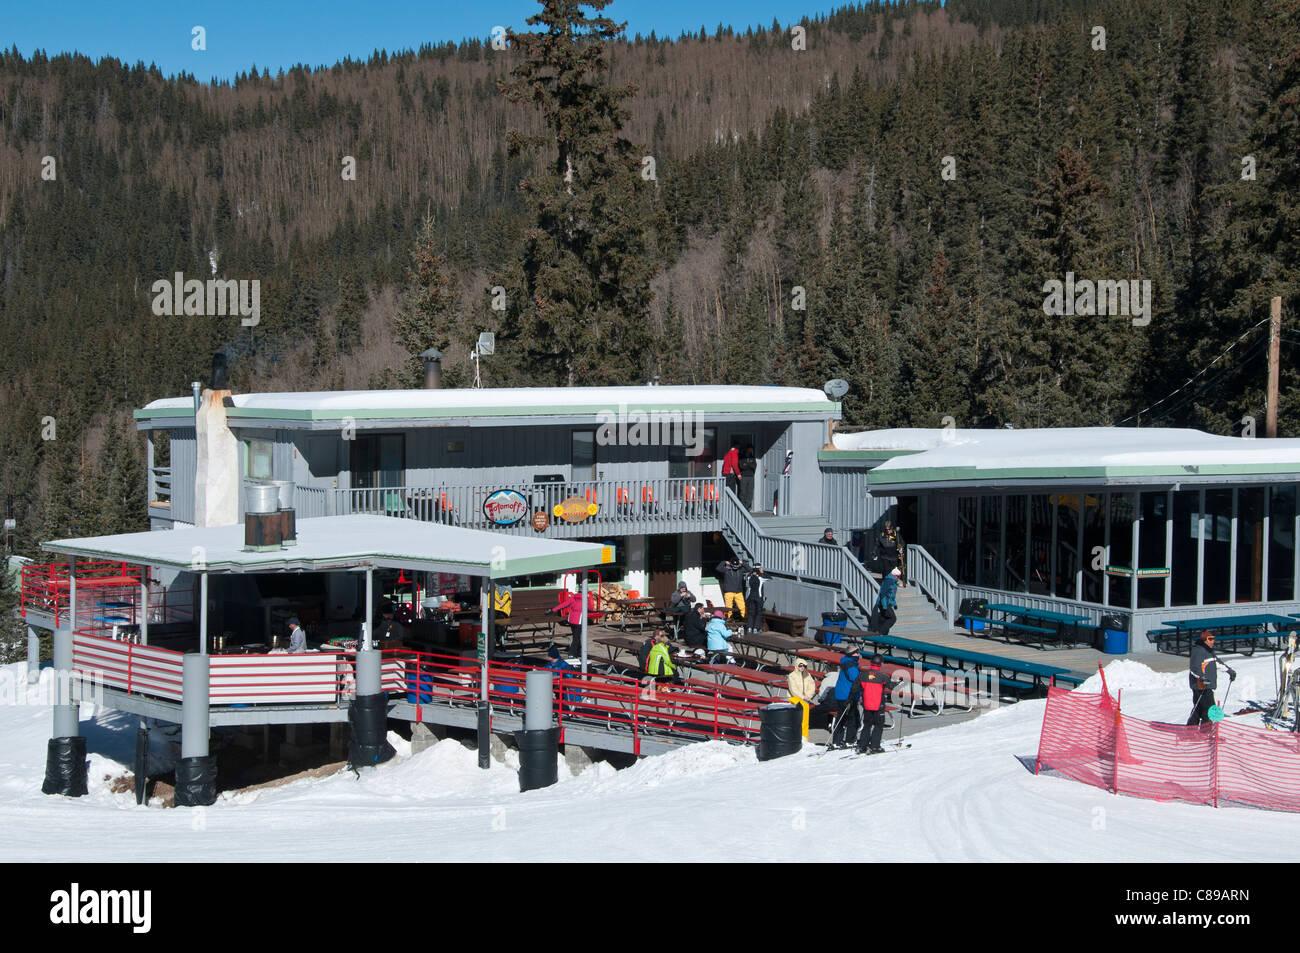 Totemoff's midmountain day lodge, Ski Santa Fe, Santa Fe, New Mexico. - Stock Image